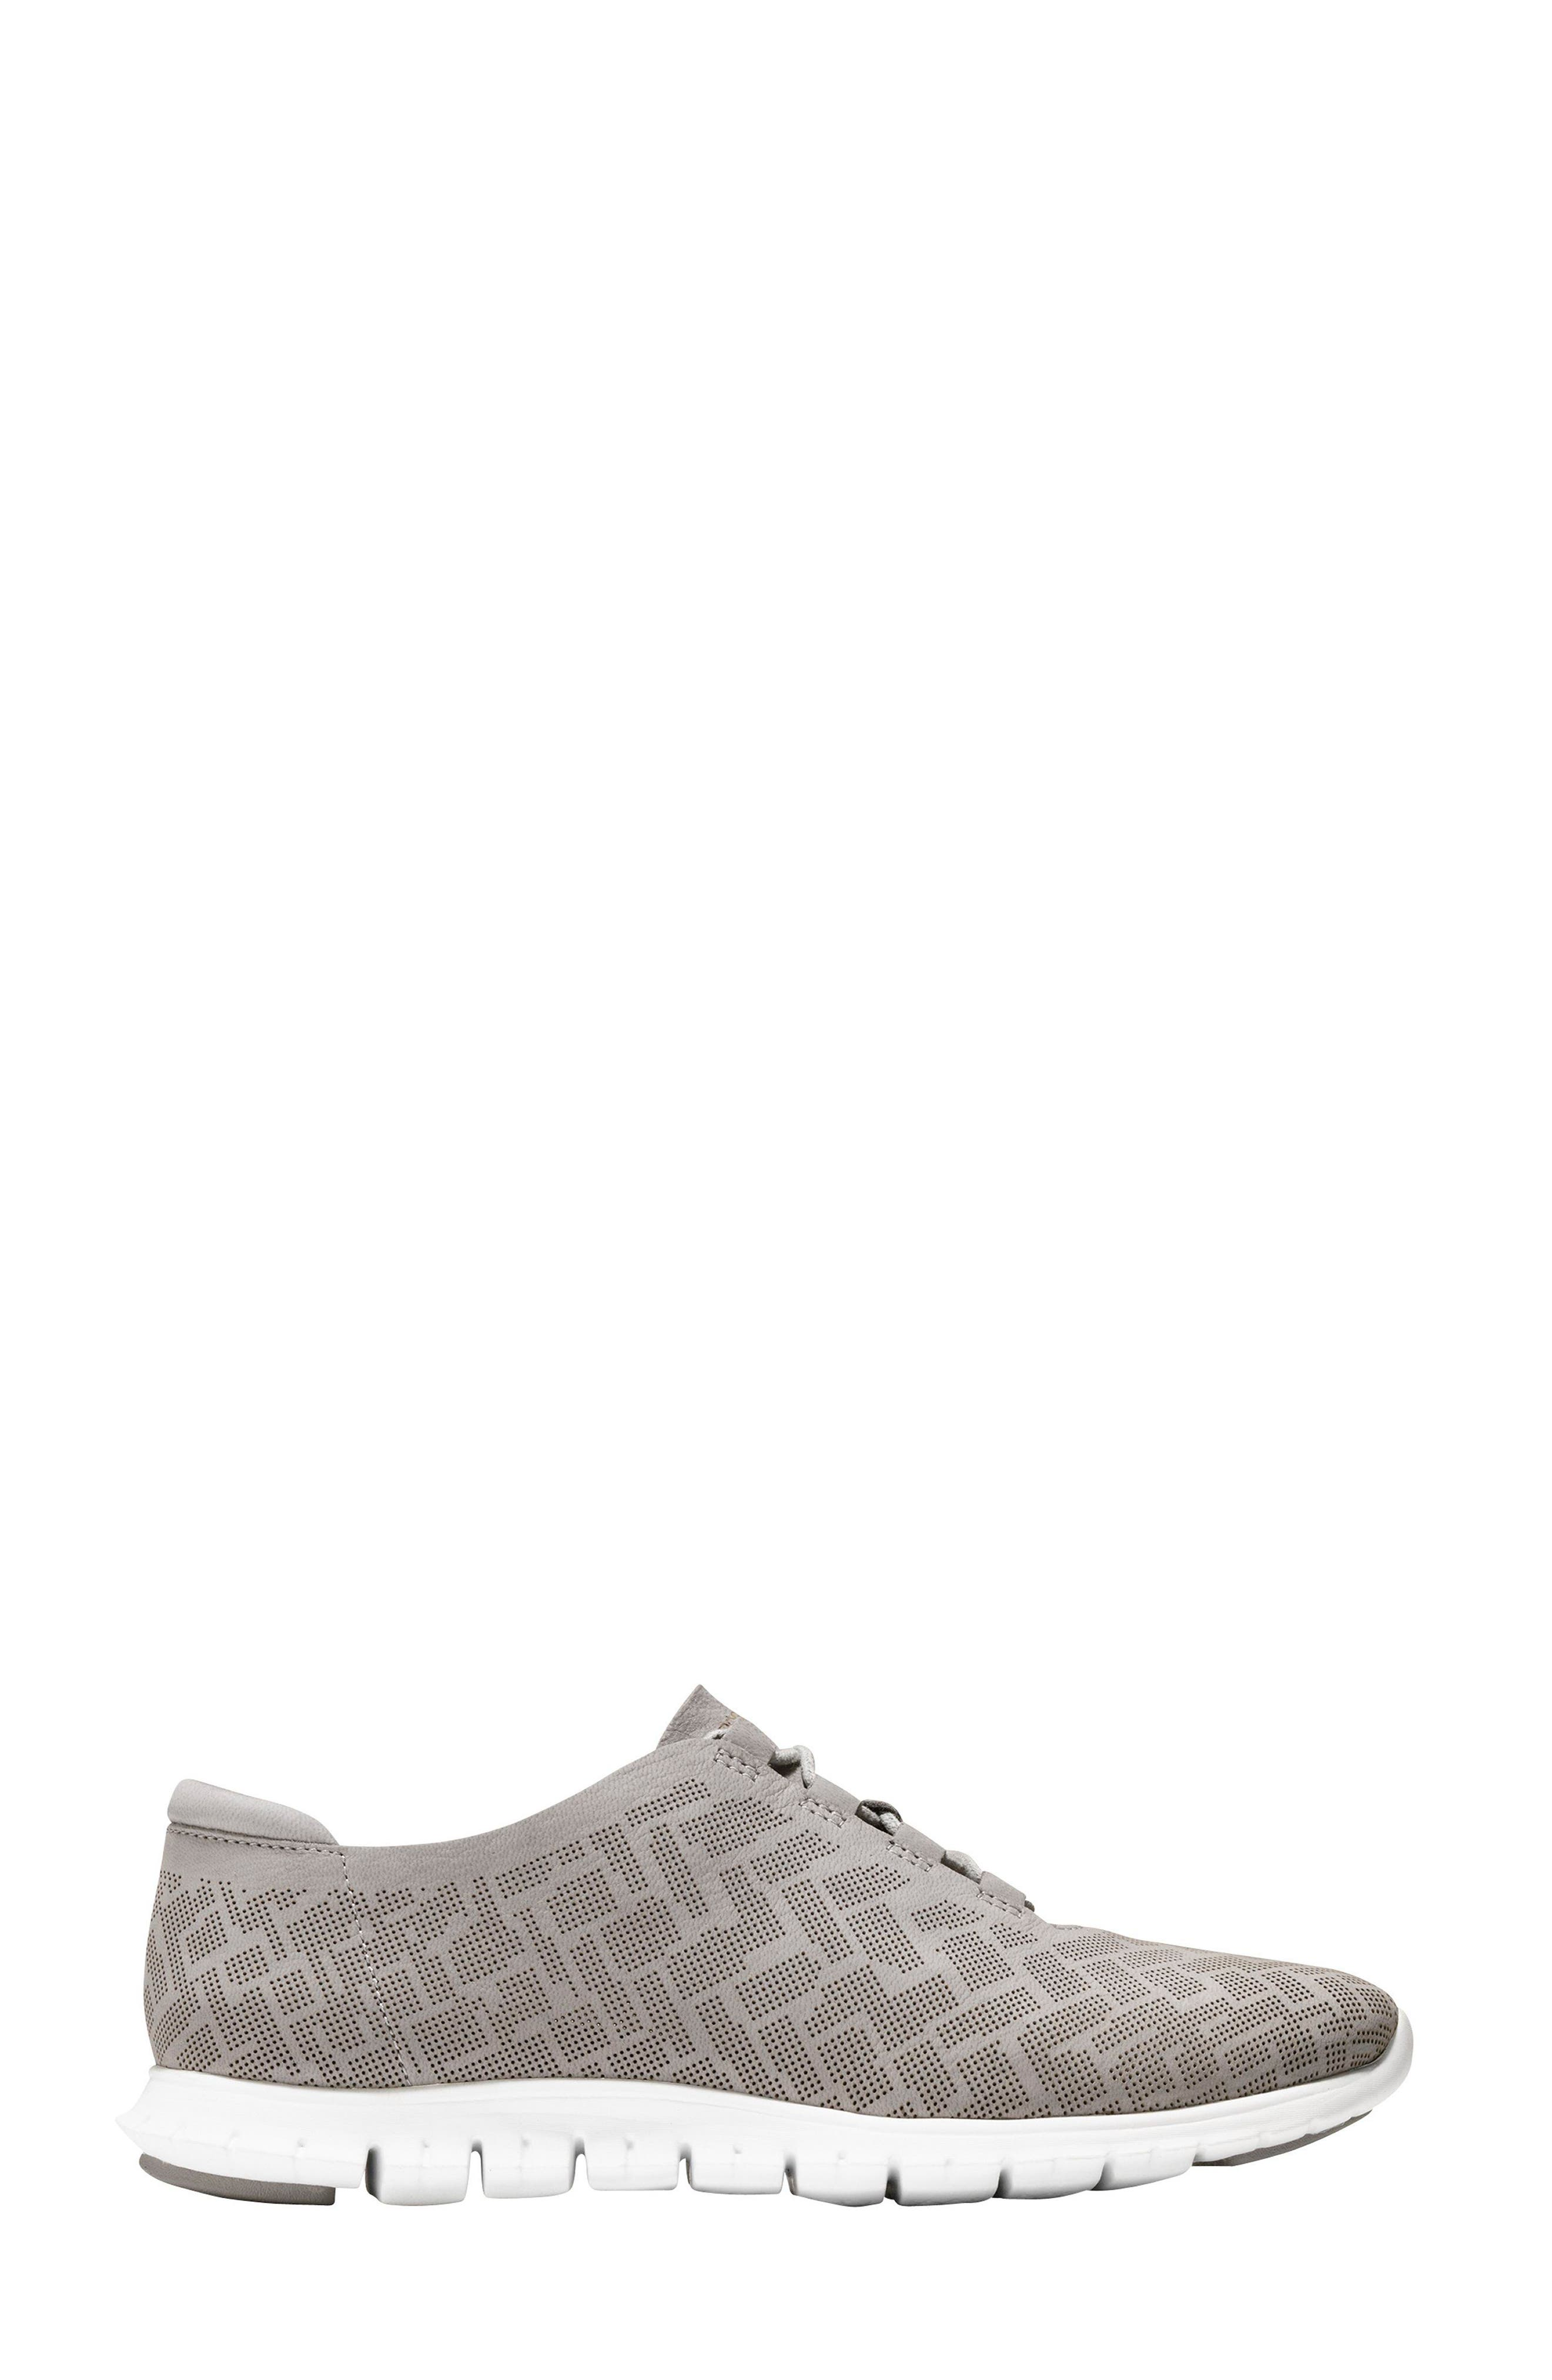 ZERØGRAND Genevieve Perforated Sneaker,                             Alternate thumbnail 3, color,                             Ironstone Perf Nubuck